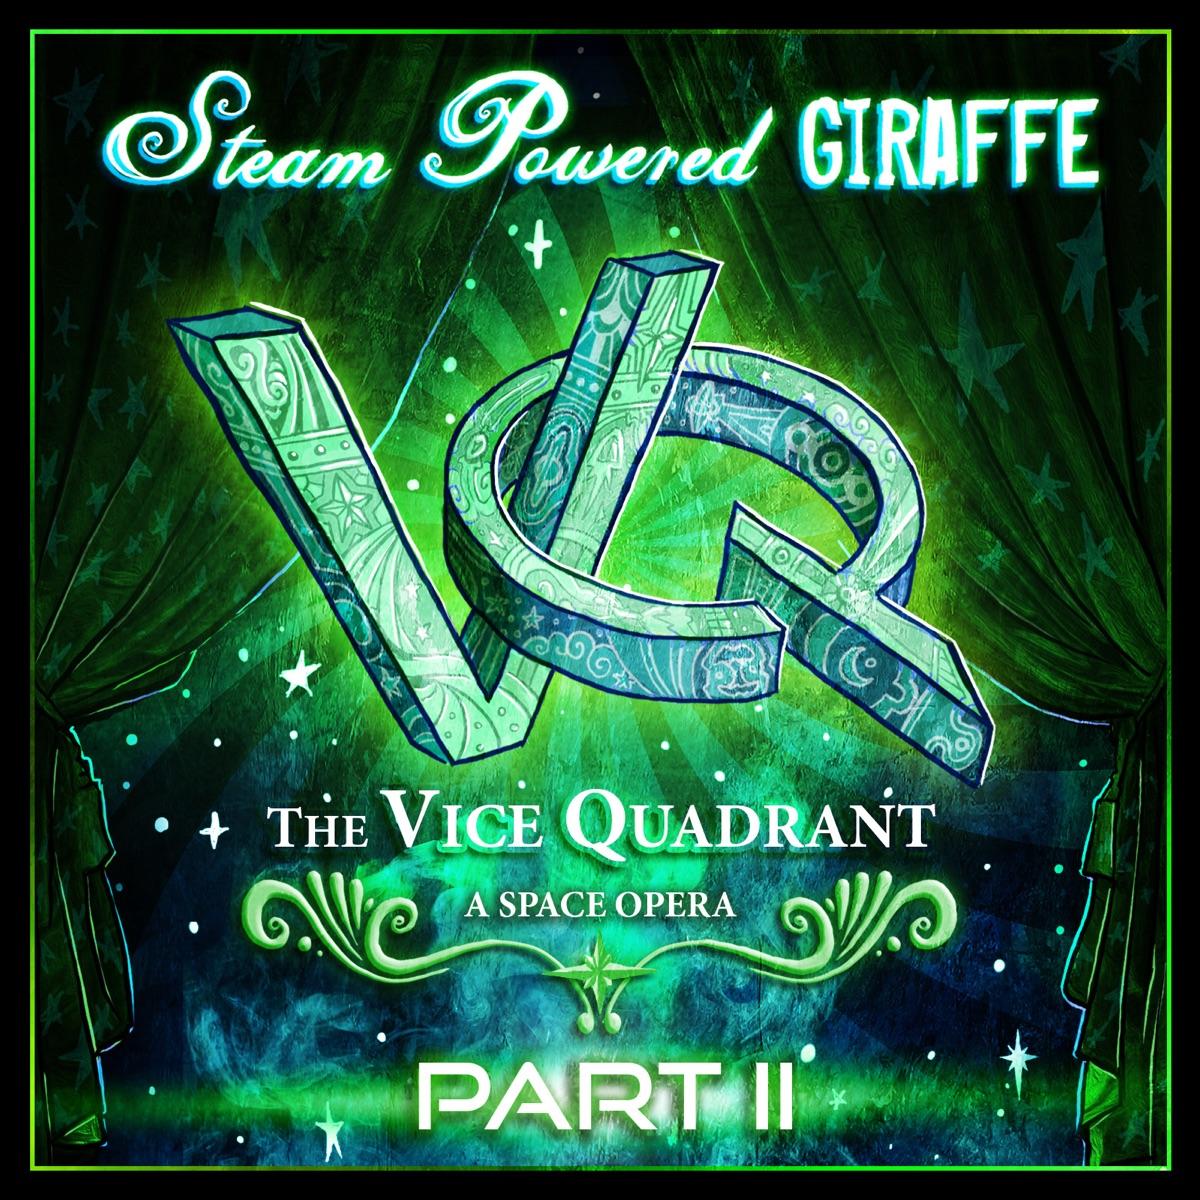 The Vice Quadrant Pt 2 Steam Powered Giraffe CD cover